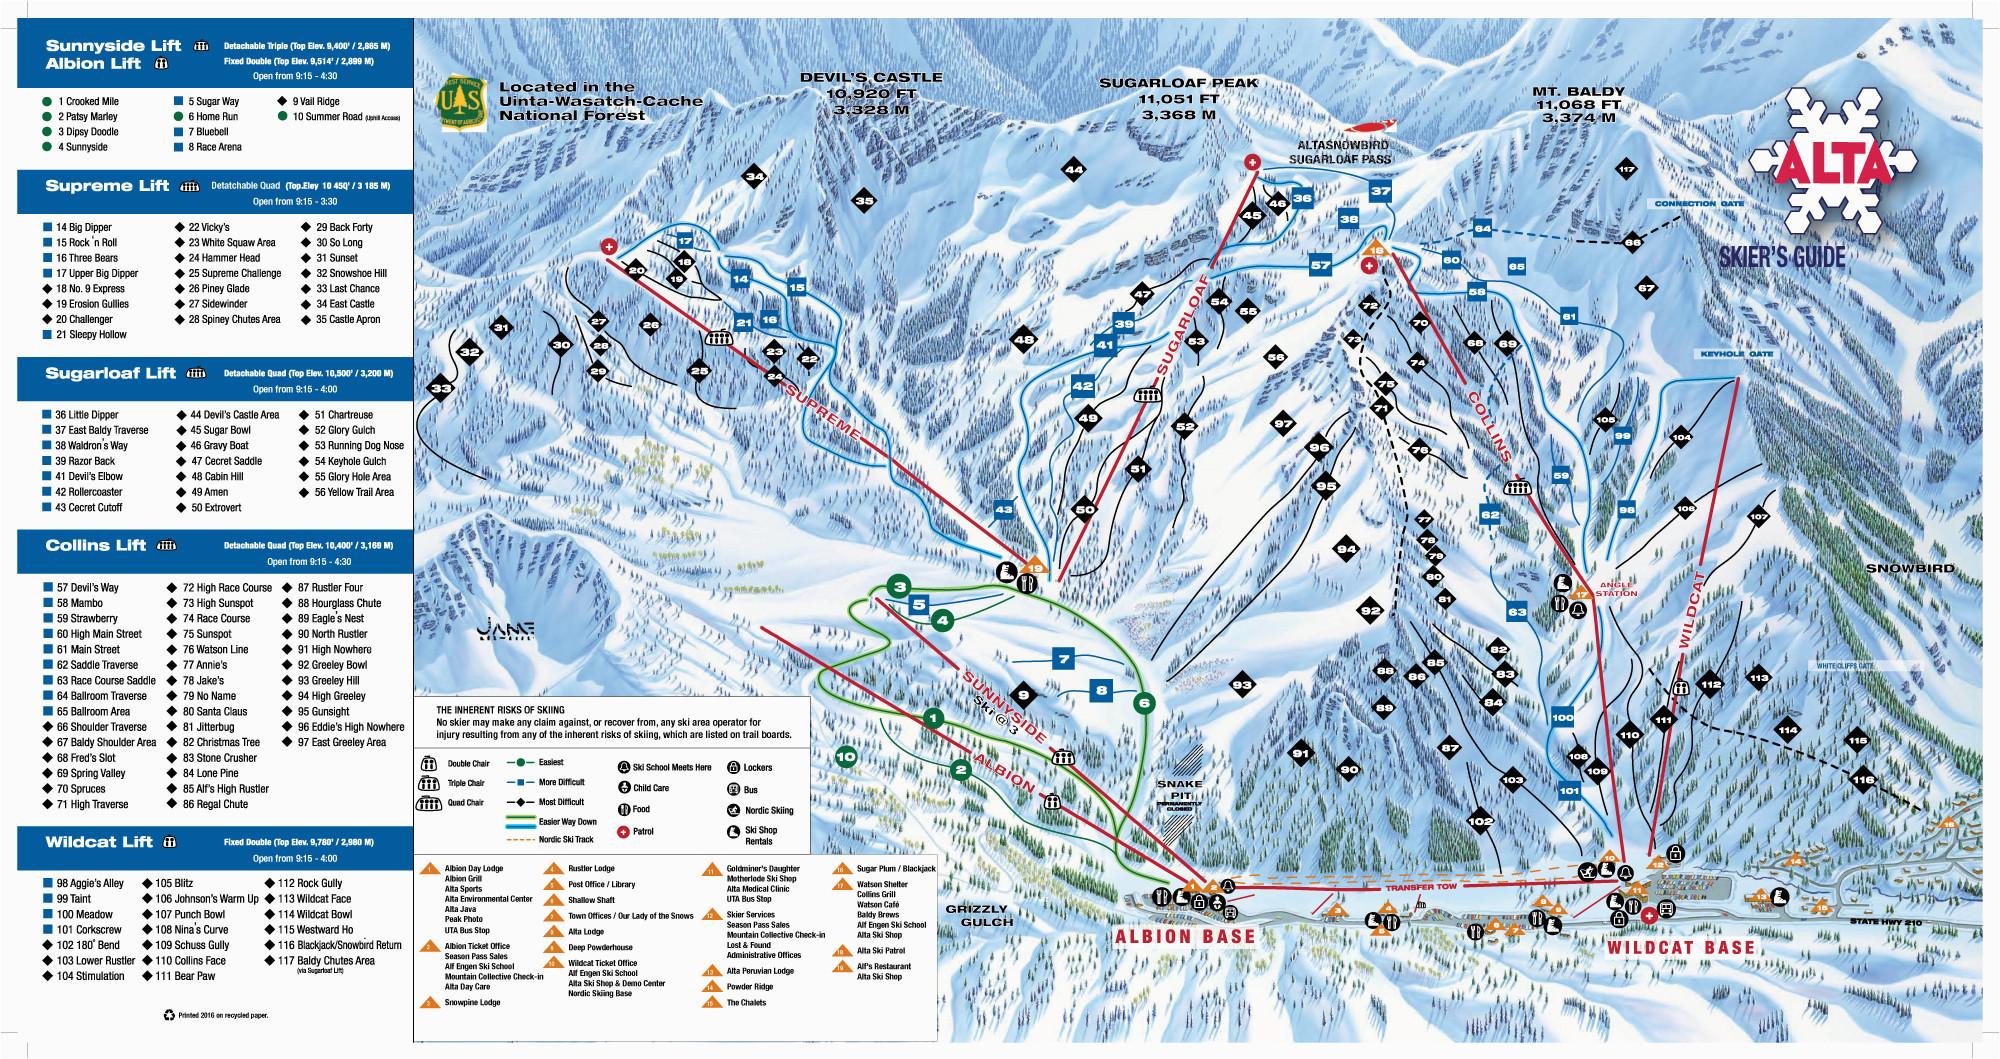 colorado ski areas map maps directions